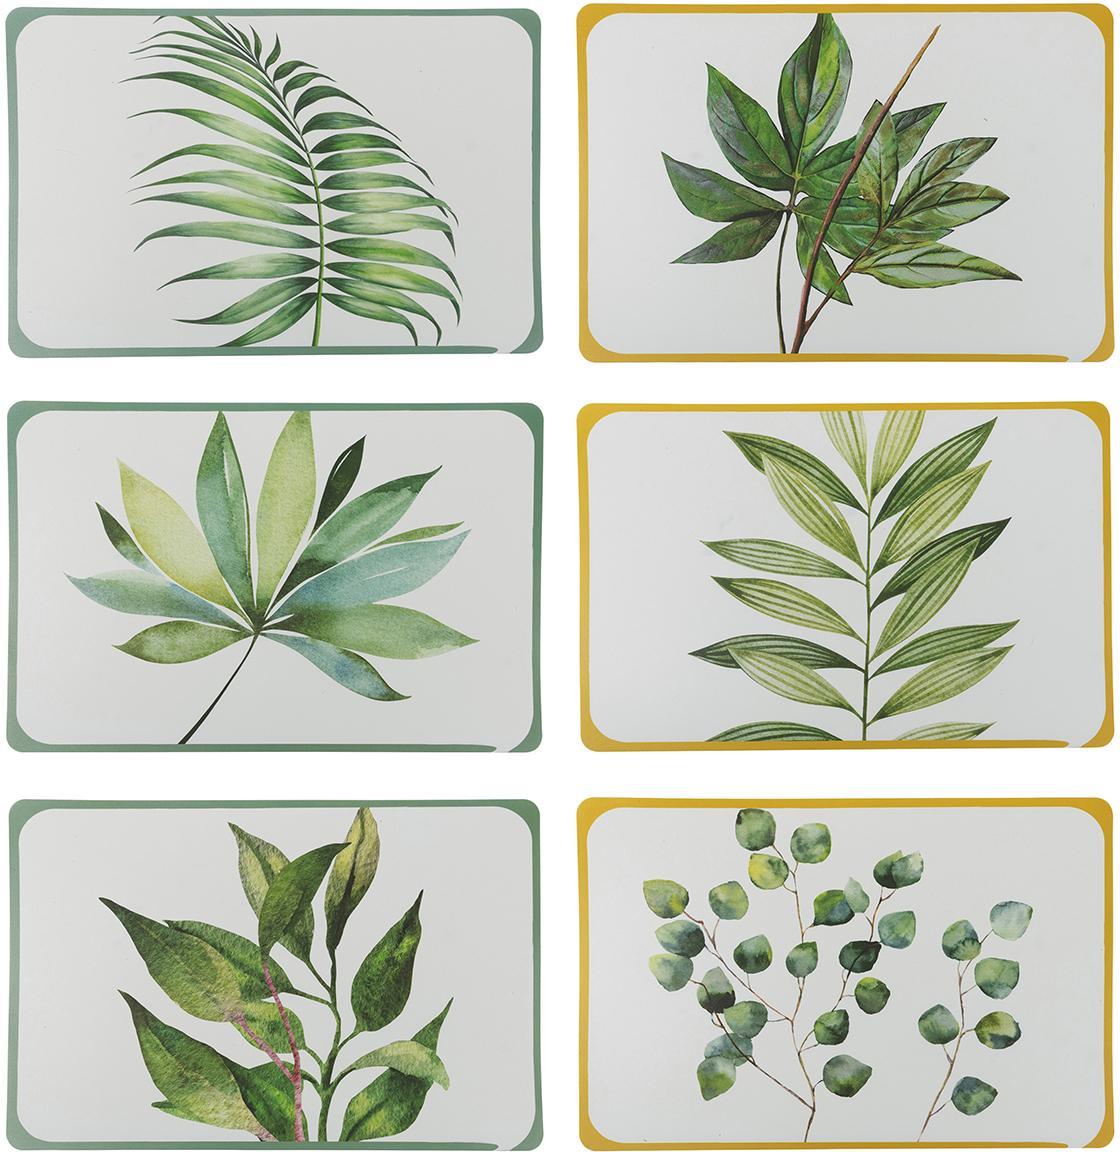 Placemats Botanique, 6-delig, Kunststof, Wit, groen, geel, B 45 x D 30 cm